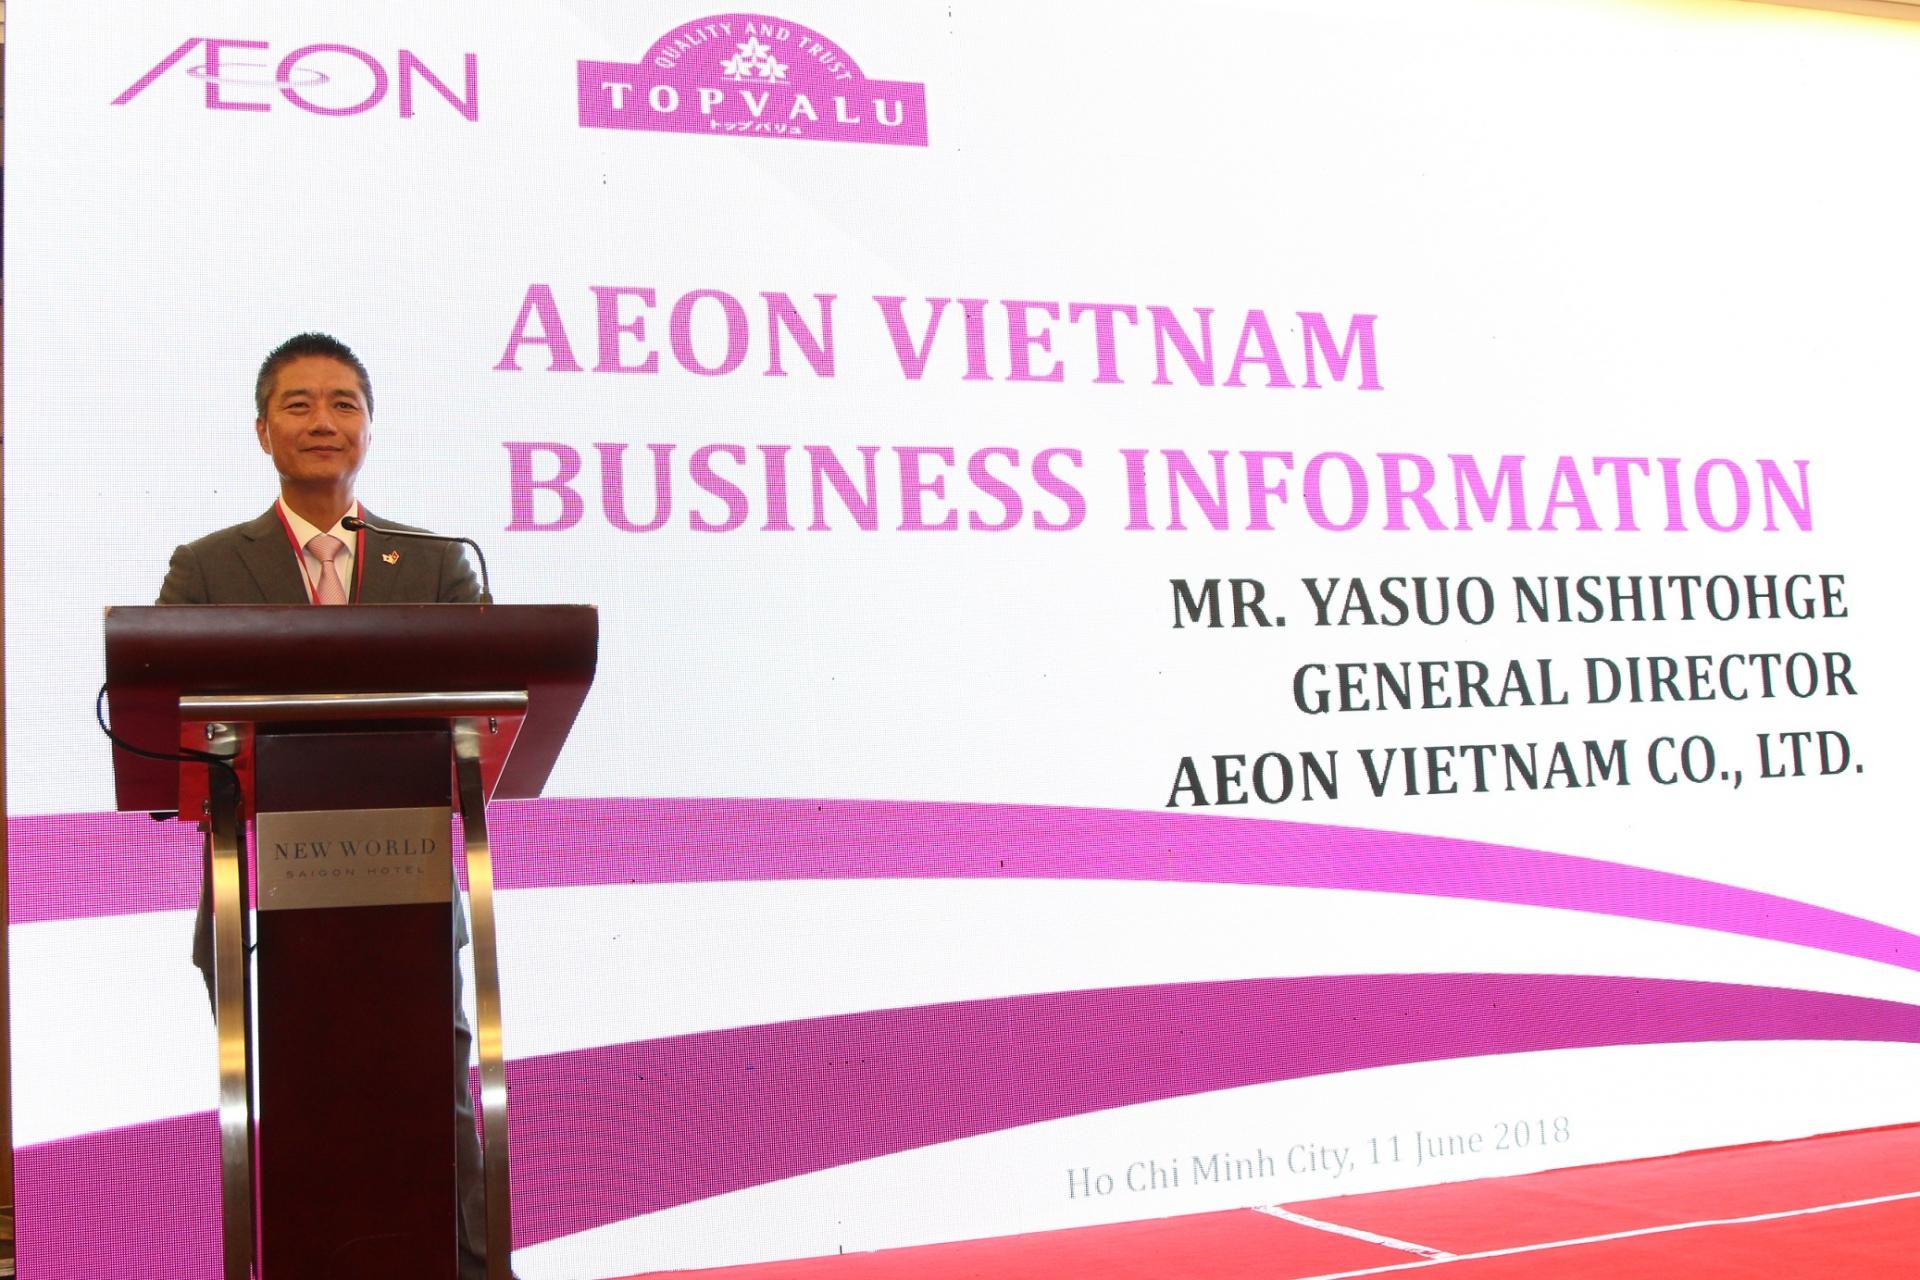 aeon vietnam seeks suppliers and manufacturers